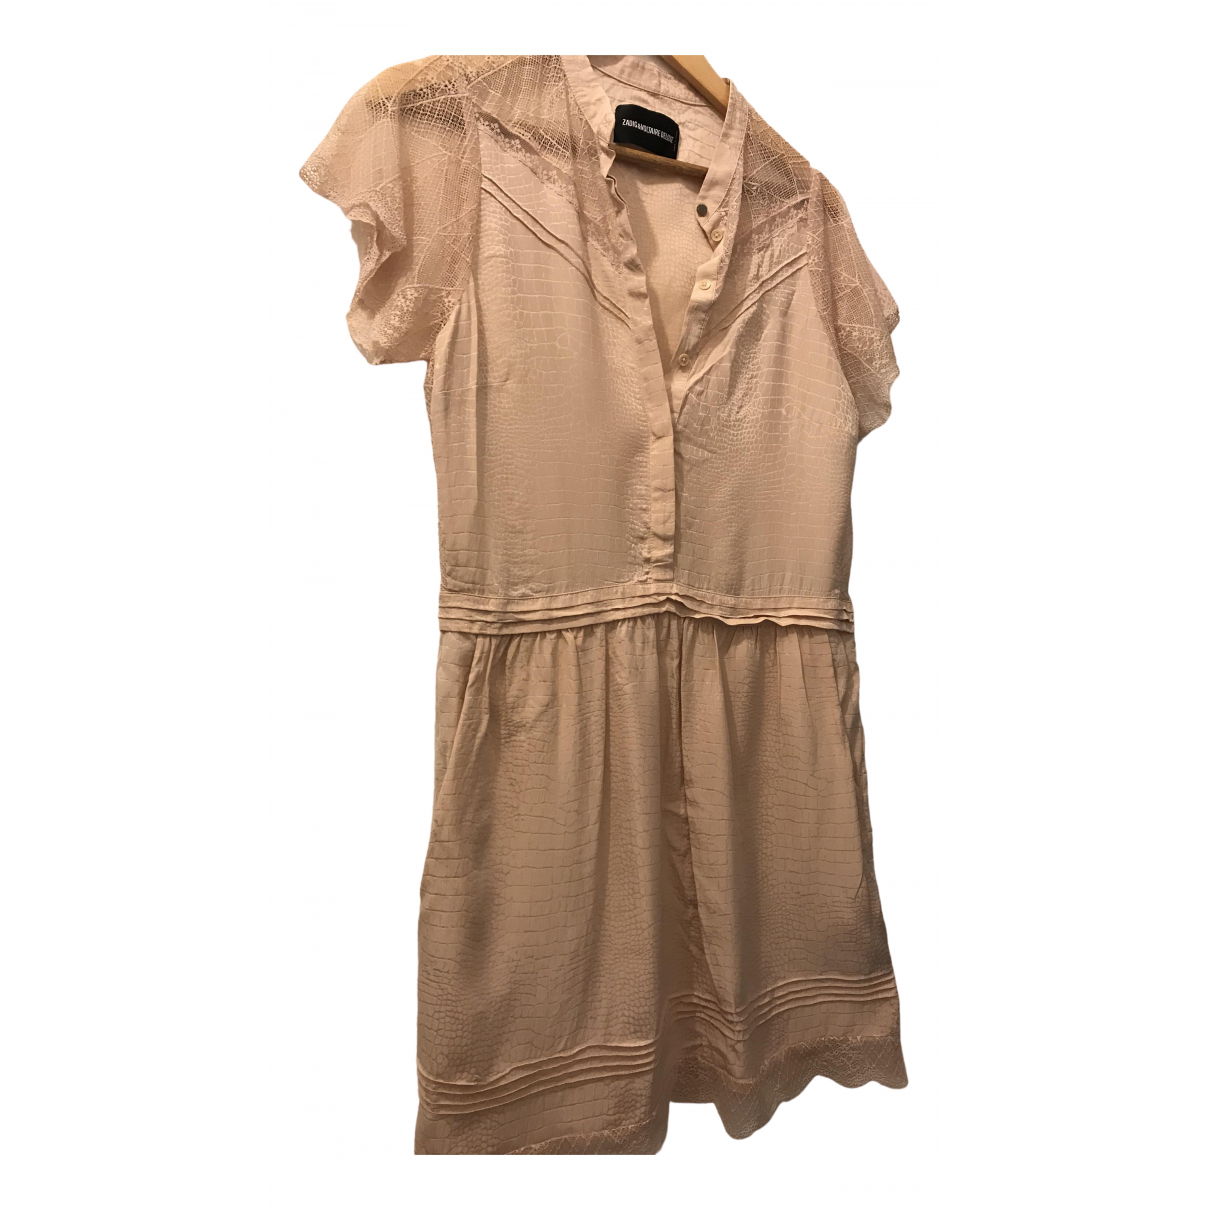 Zadig & Voltaire \N dress for Women 38 FR